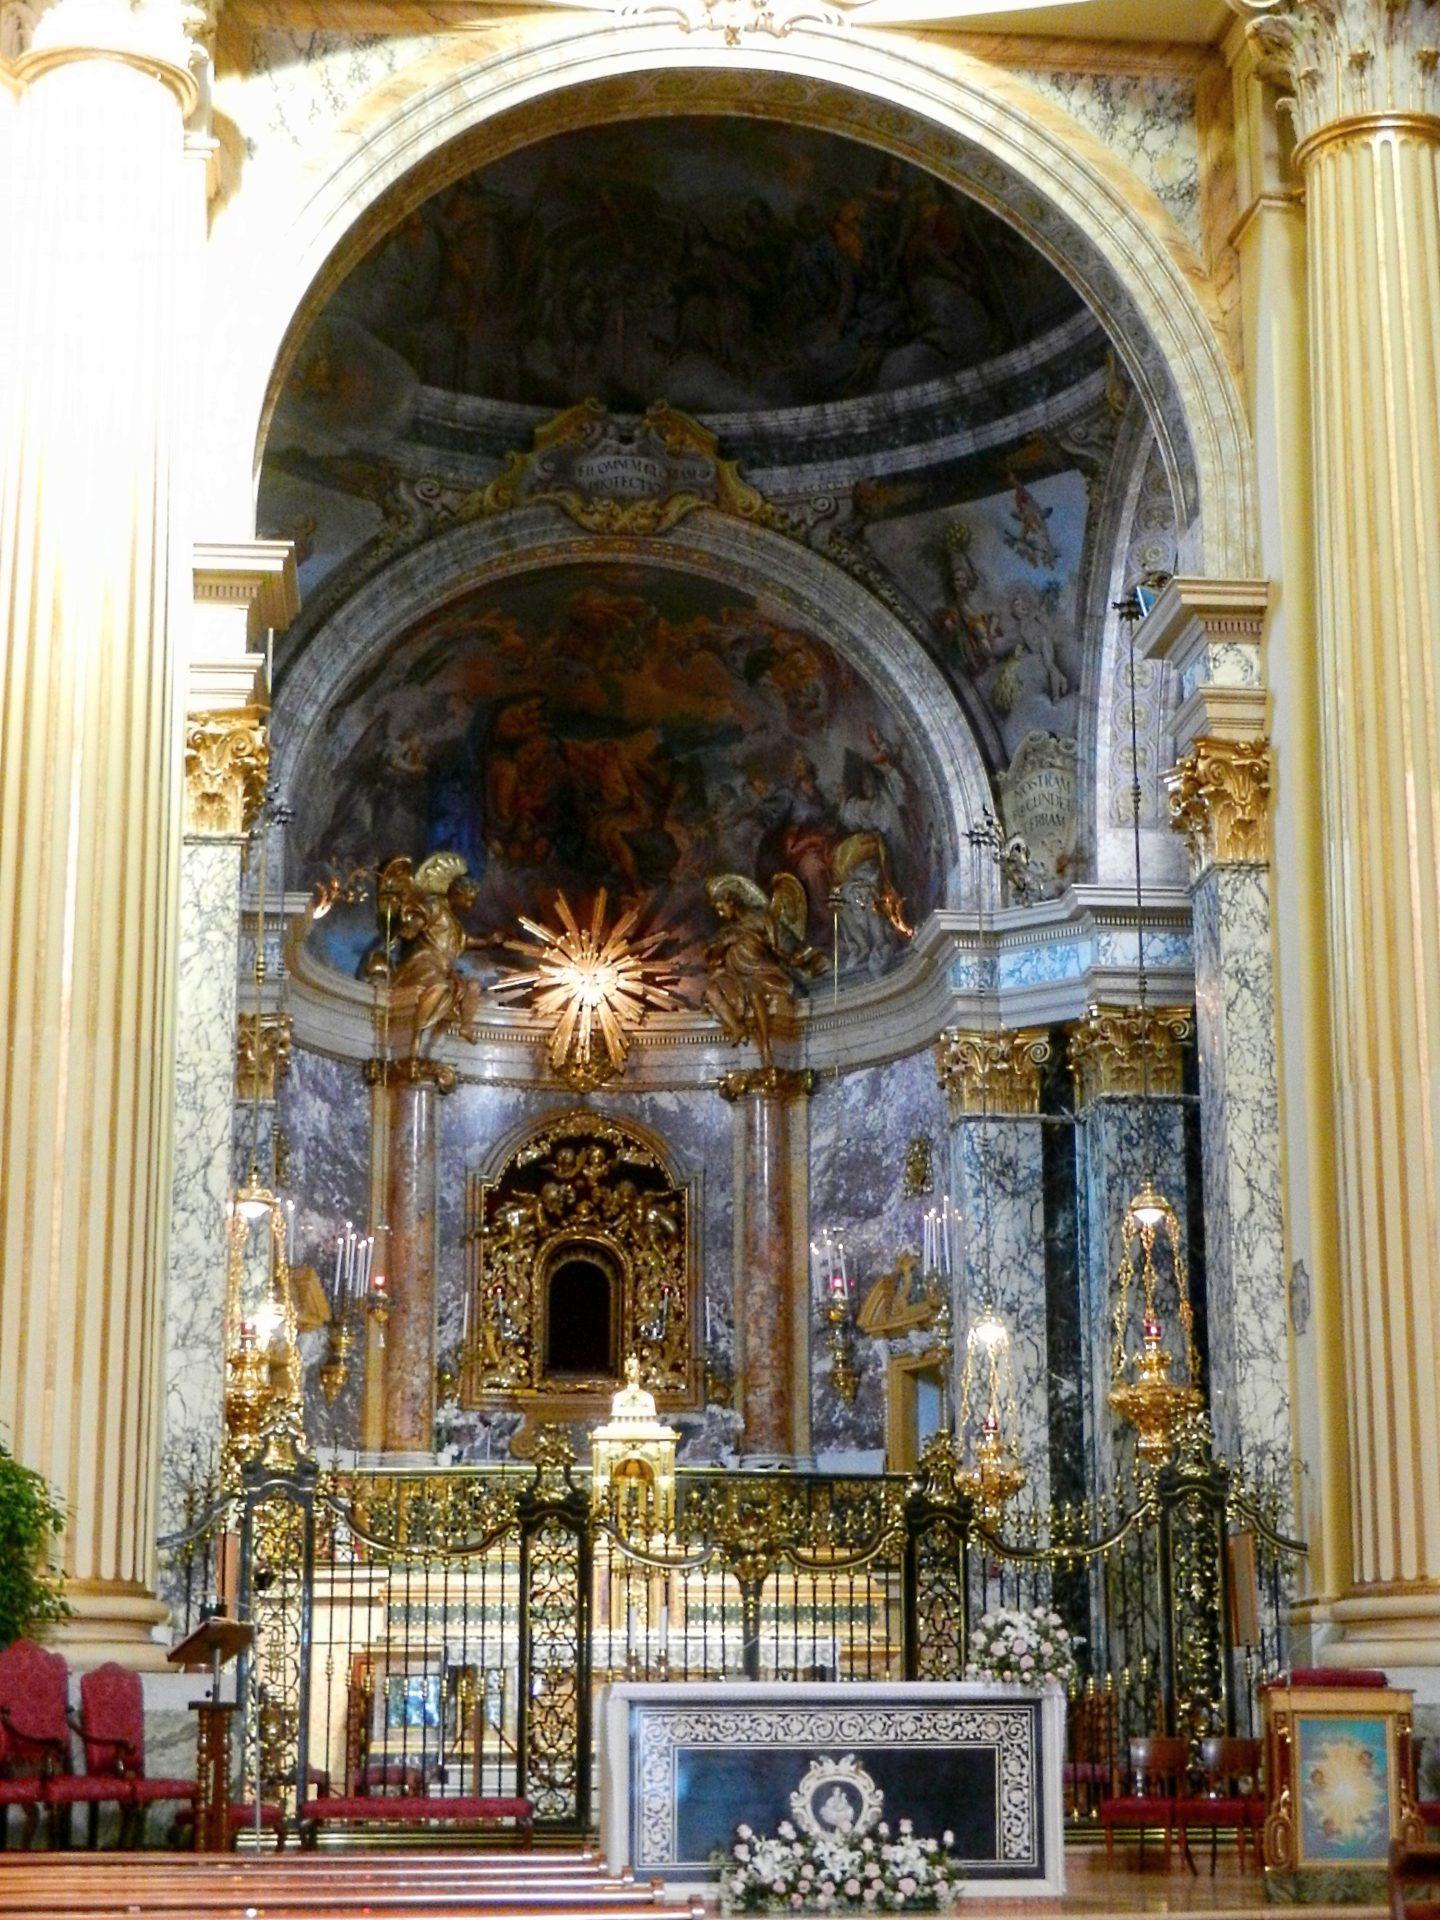 Inside Sanctuary Of The Madonna Di San Luca Bologna Watermelon Wallpaper Rainbow Find Free HD for Desktop [freshlhys.tk]